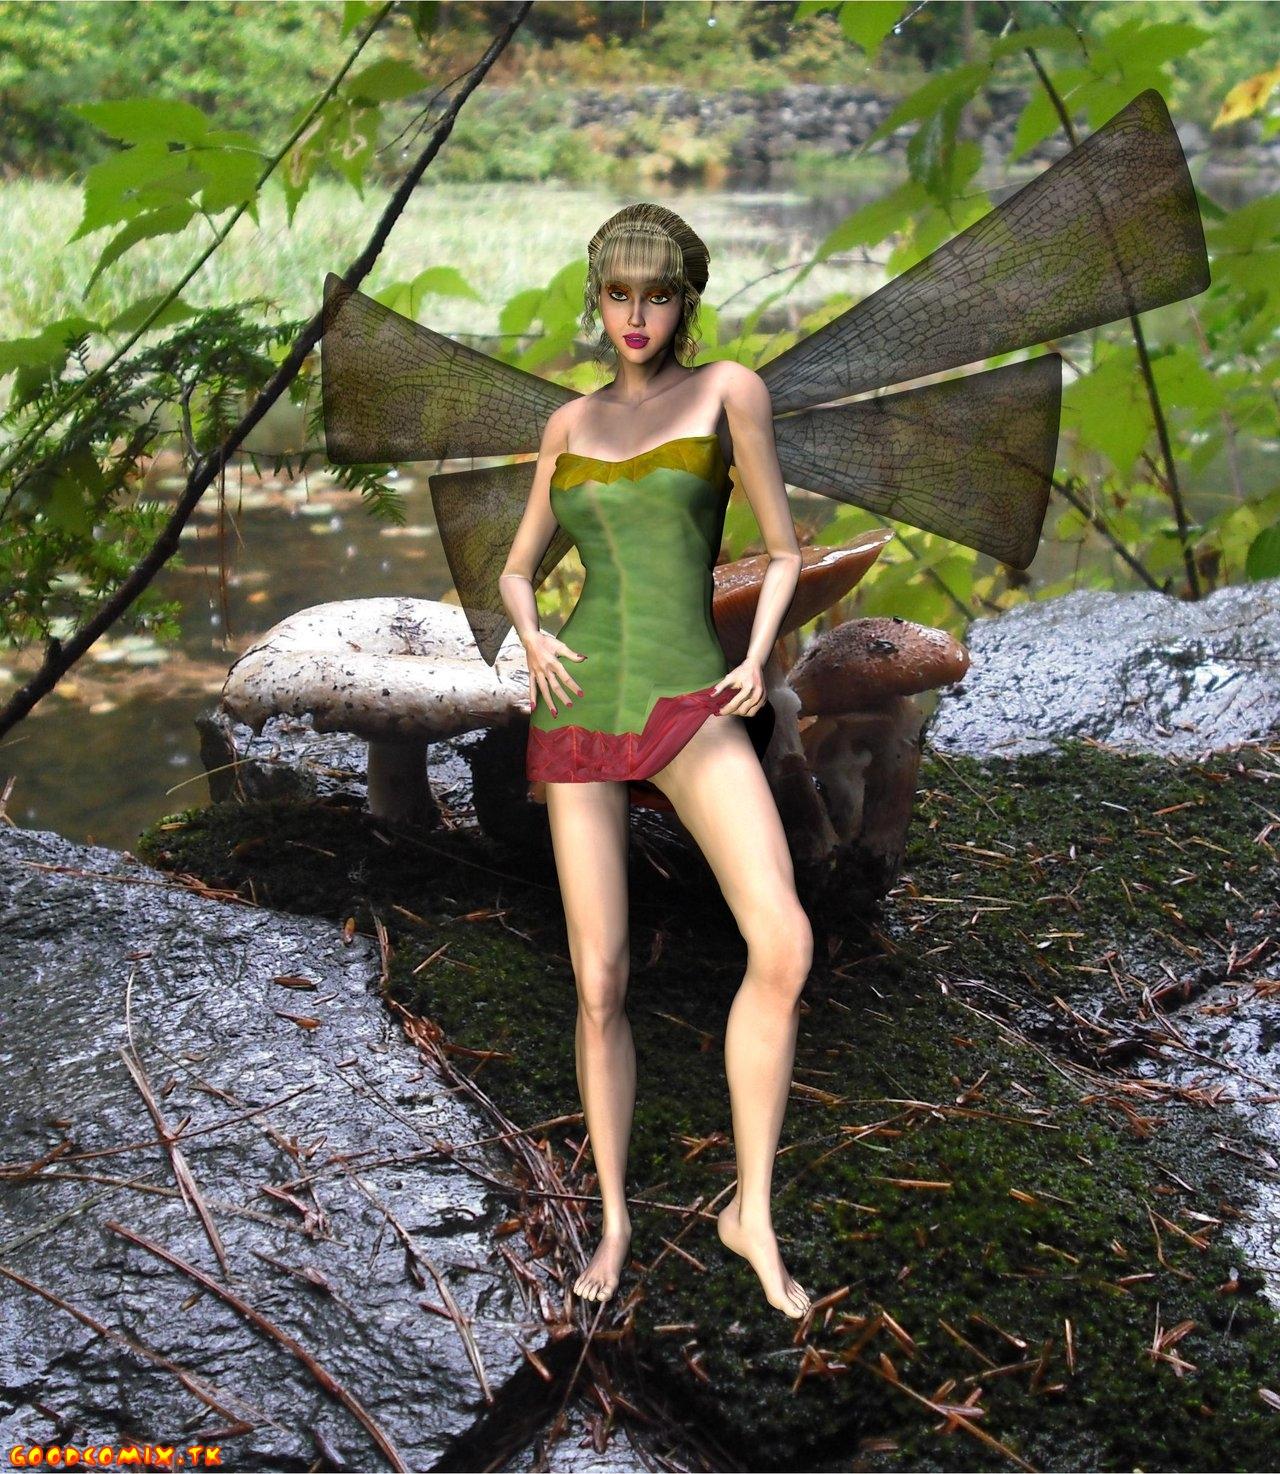 Goodcomix.tk Peter Pan - [Ipokino] - Someone Loves Tink - Bad Pixie